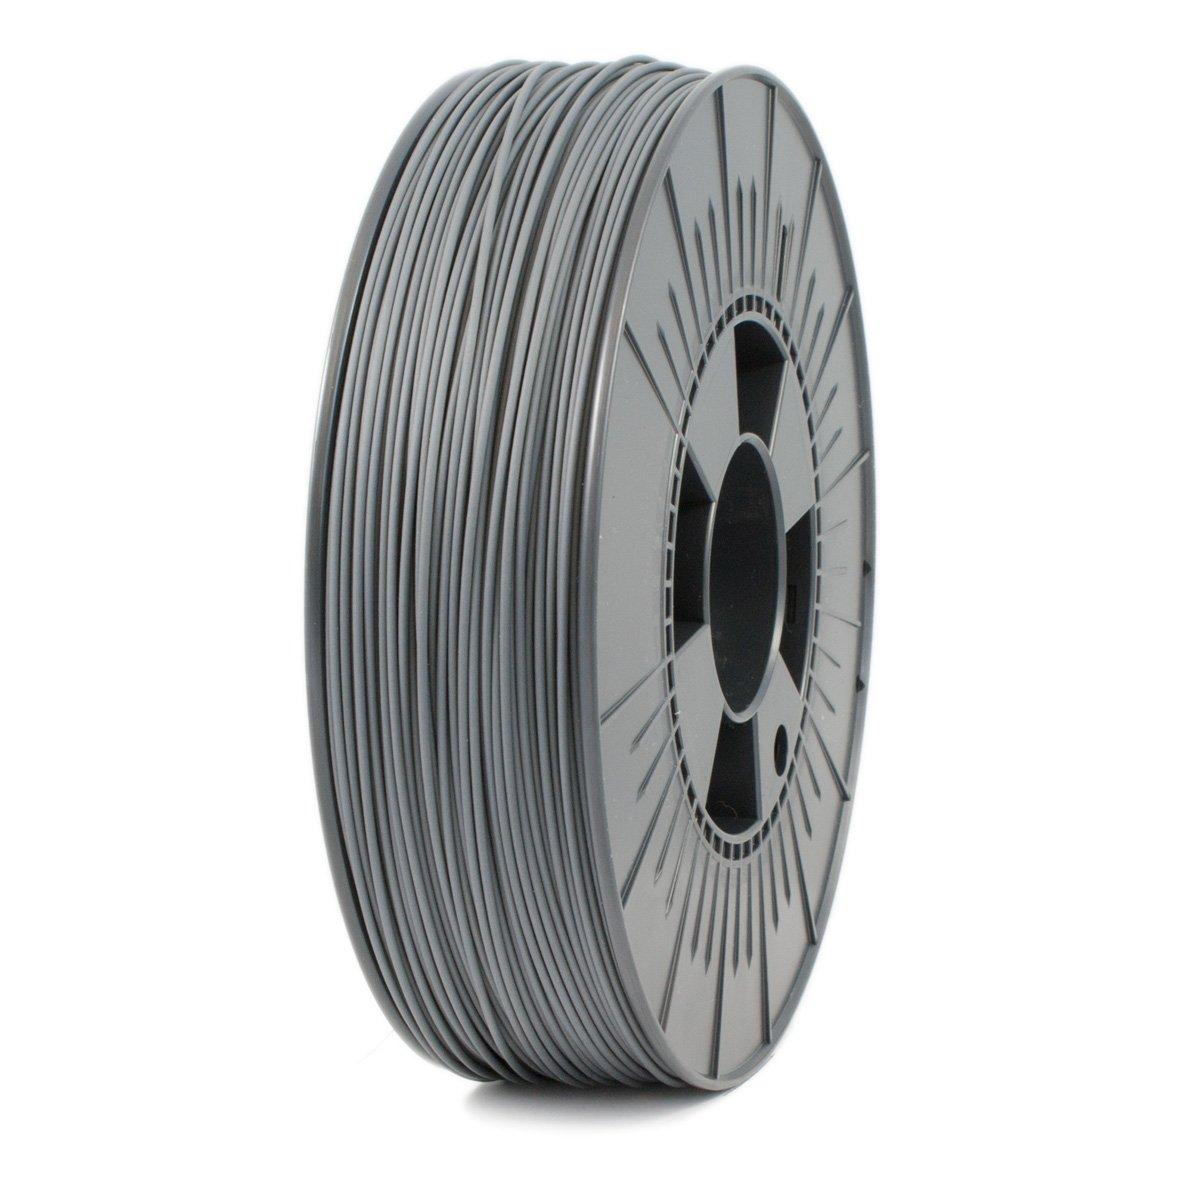 ICE FILAMENTS ICEFIL1HPS146 HIPS Filament, 1.75 mm, 0.75 kg, Gentle Grey DF